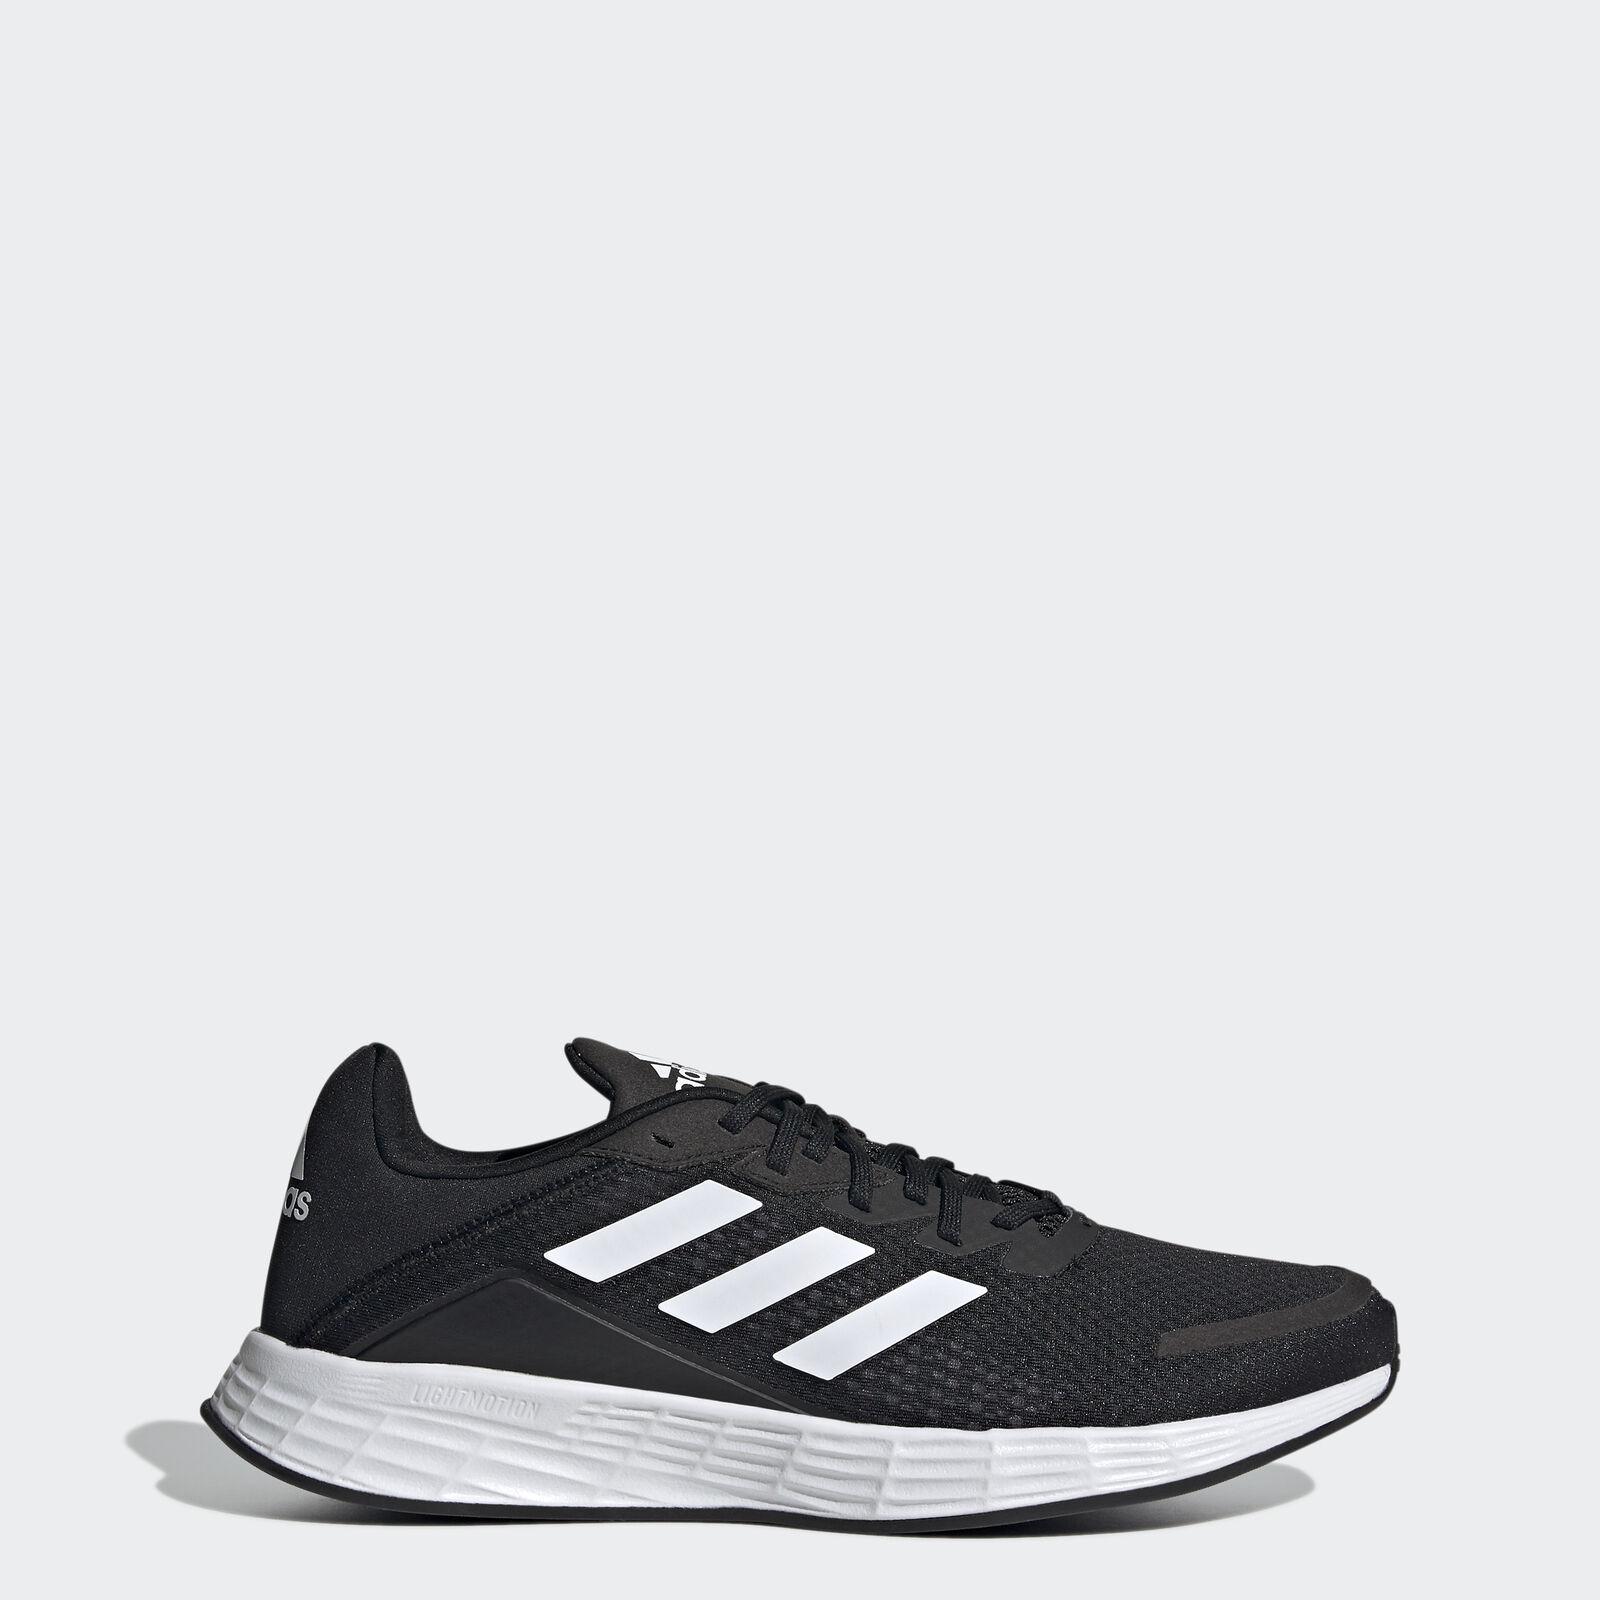 adidas Men's Duramo SL Shoes $33 + Free shipping